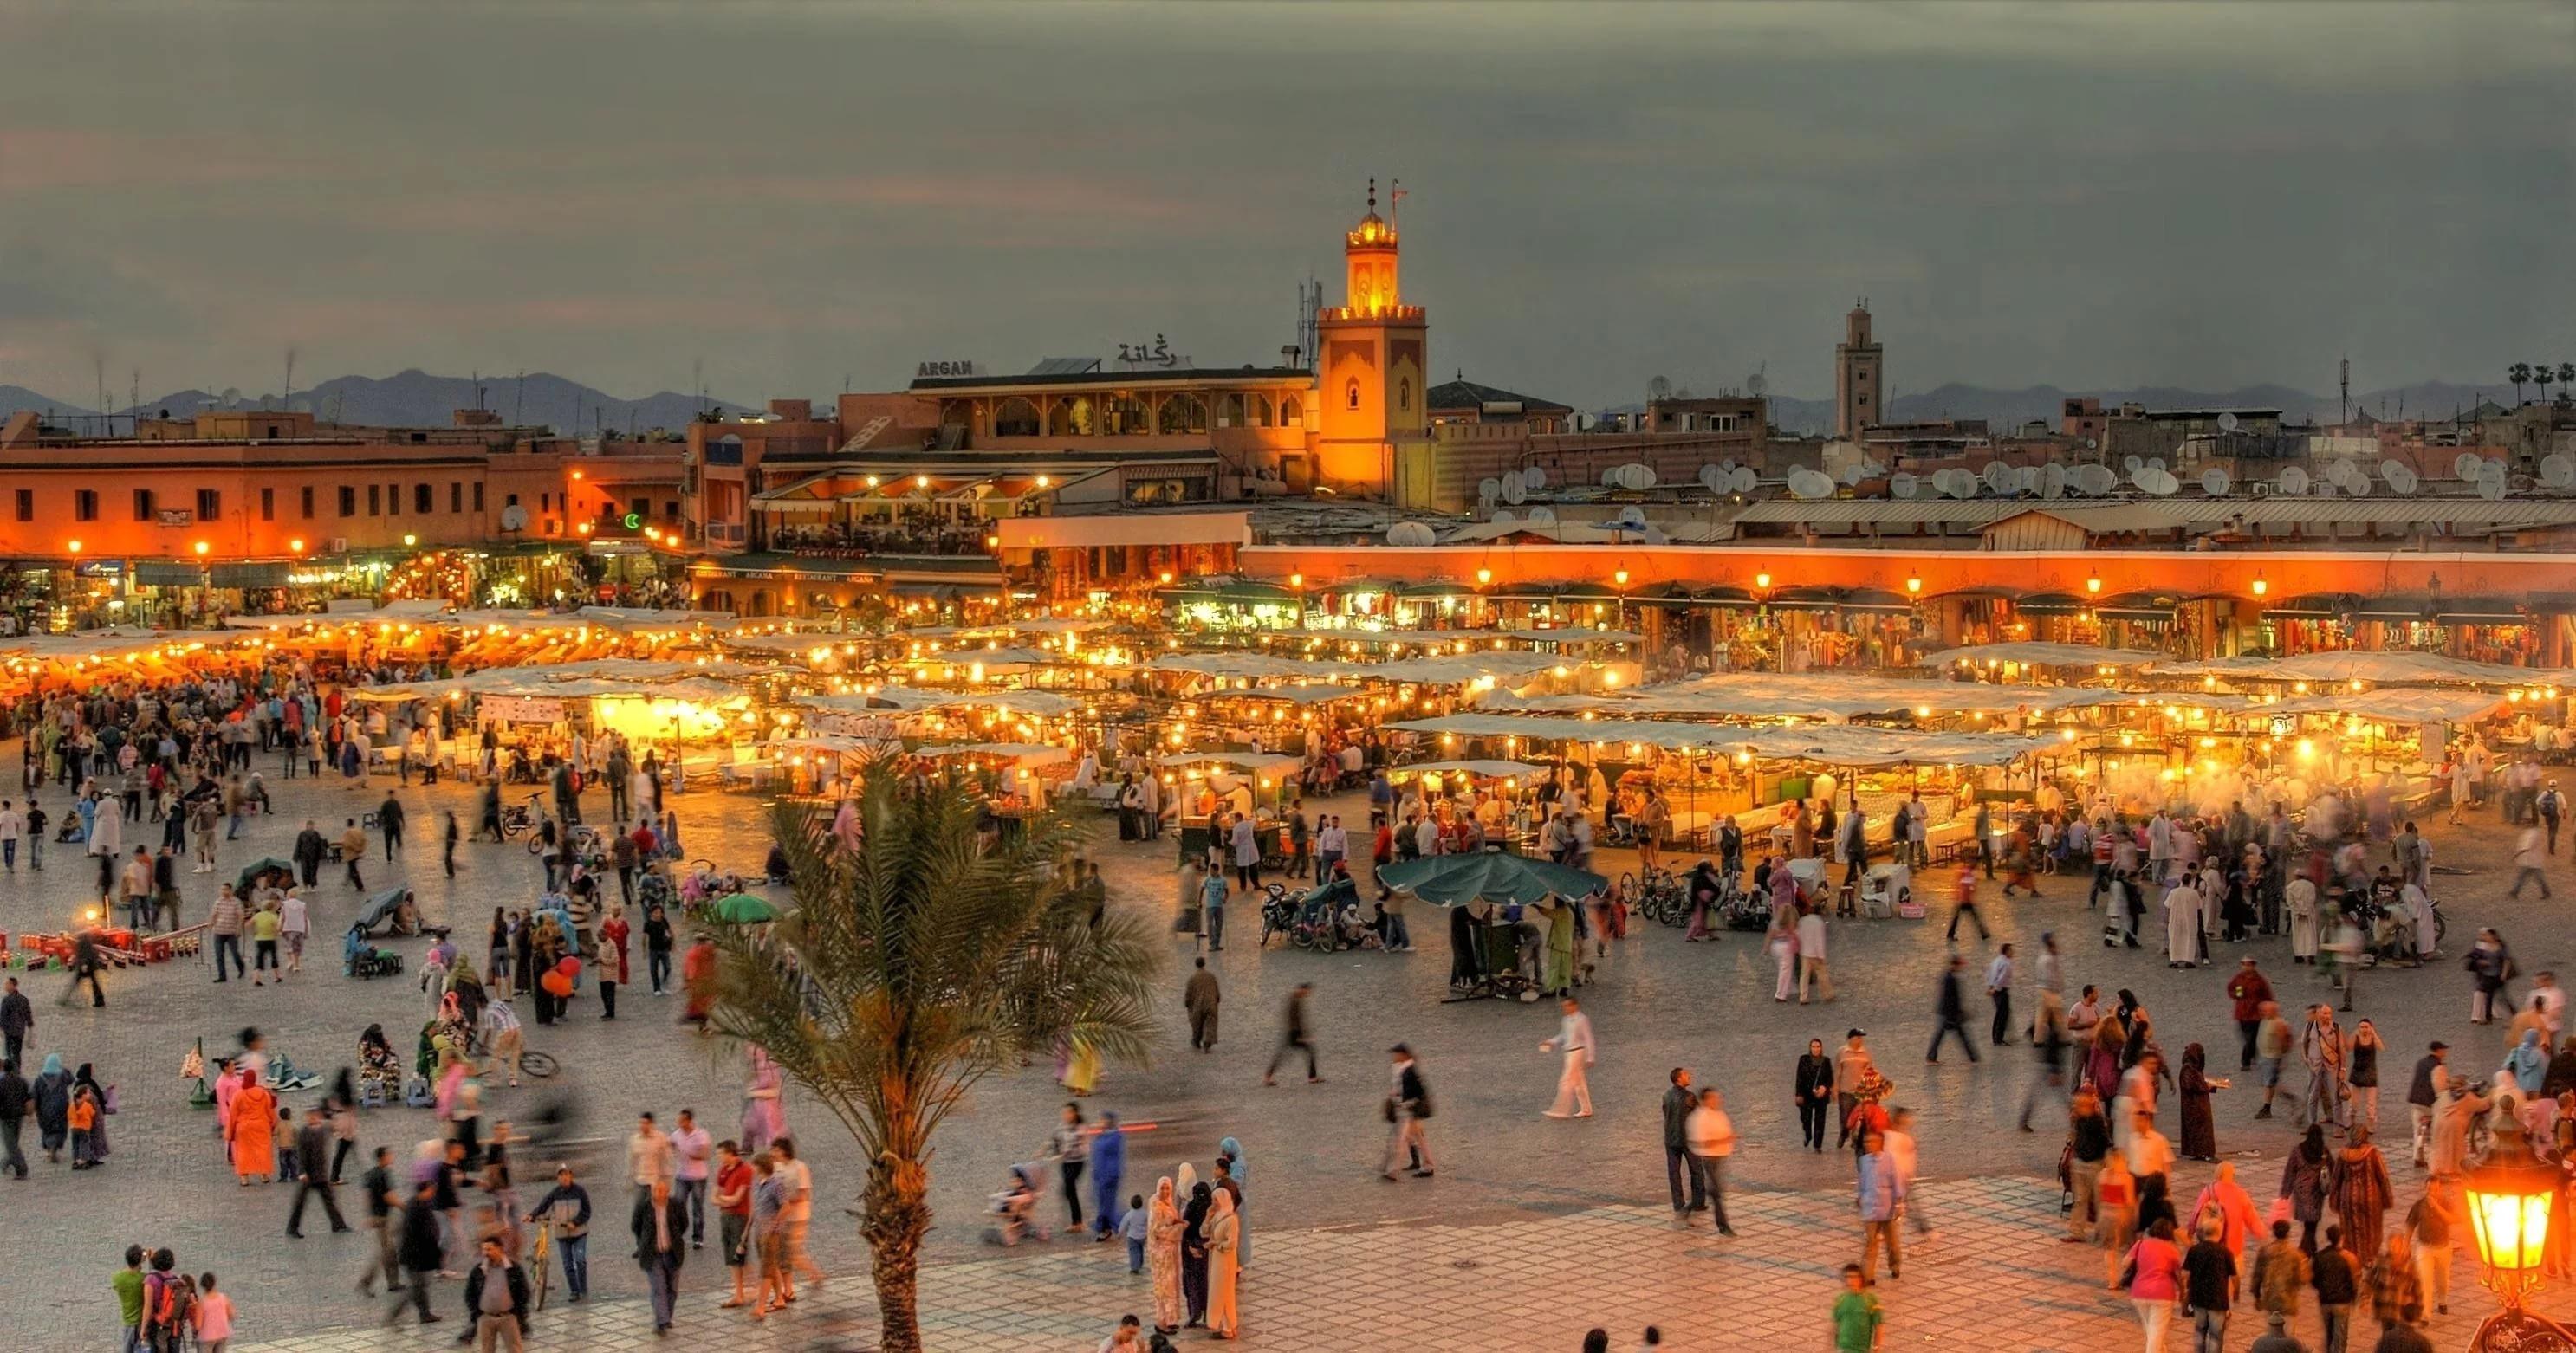 Res: 2973x1562, 3840x2160 Morocco Wallpaper